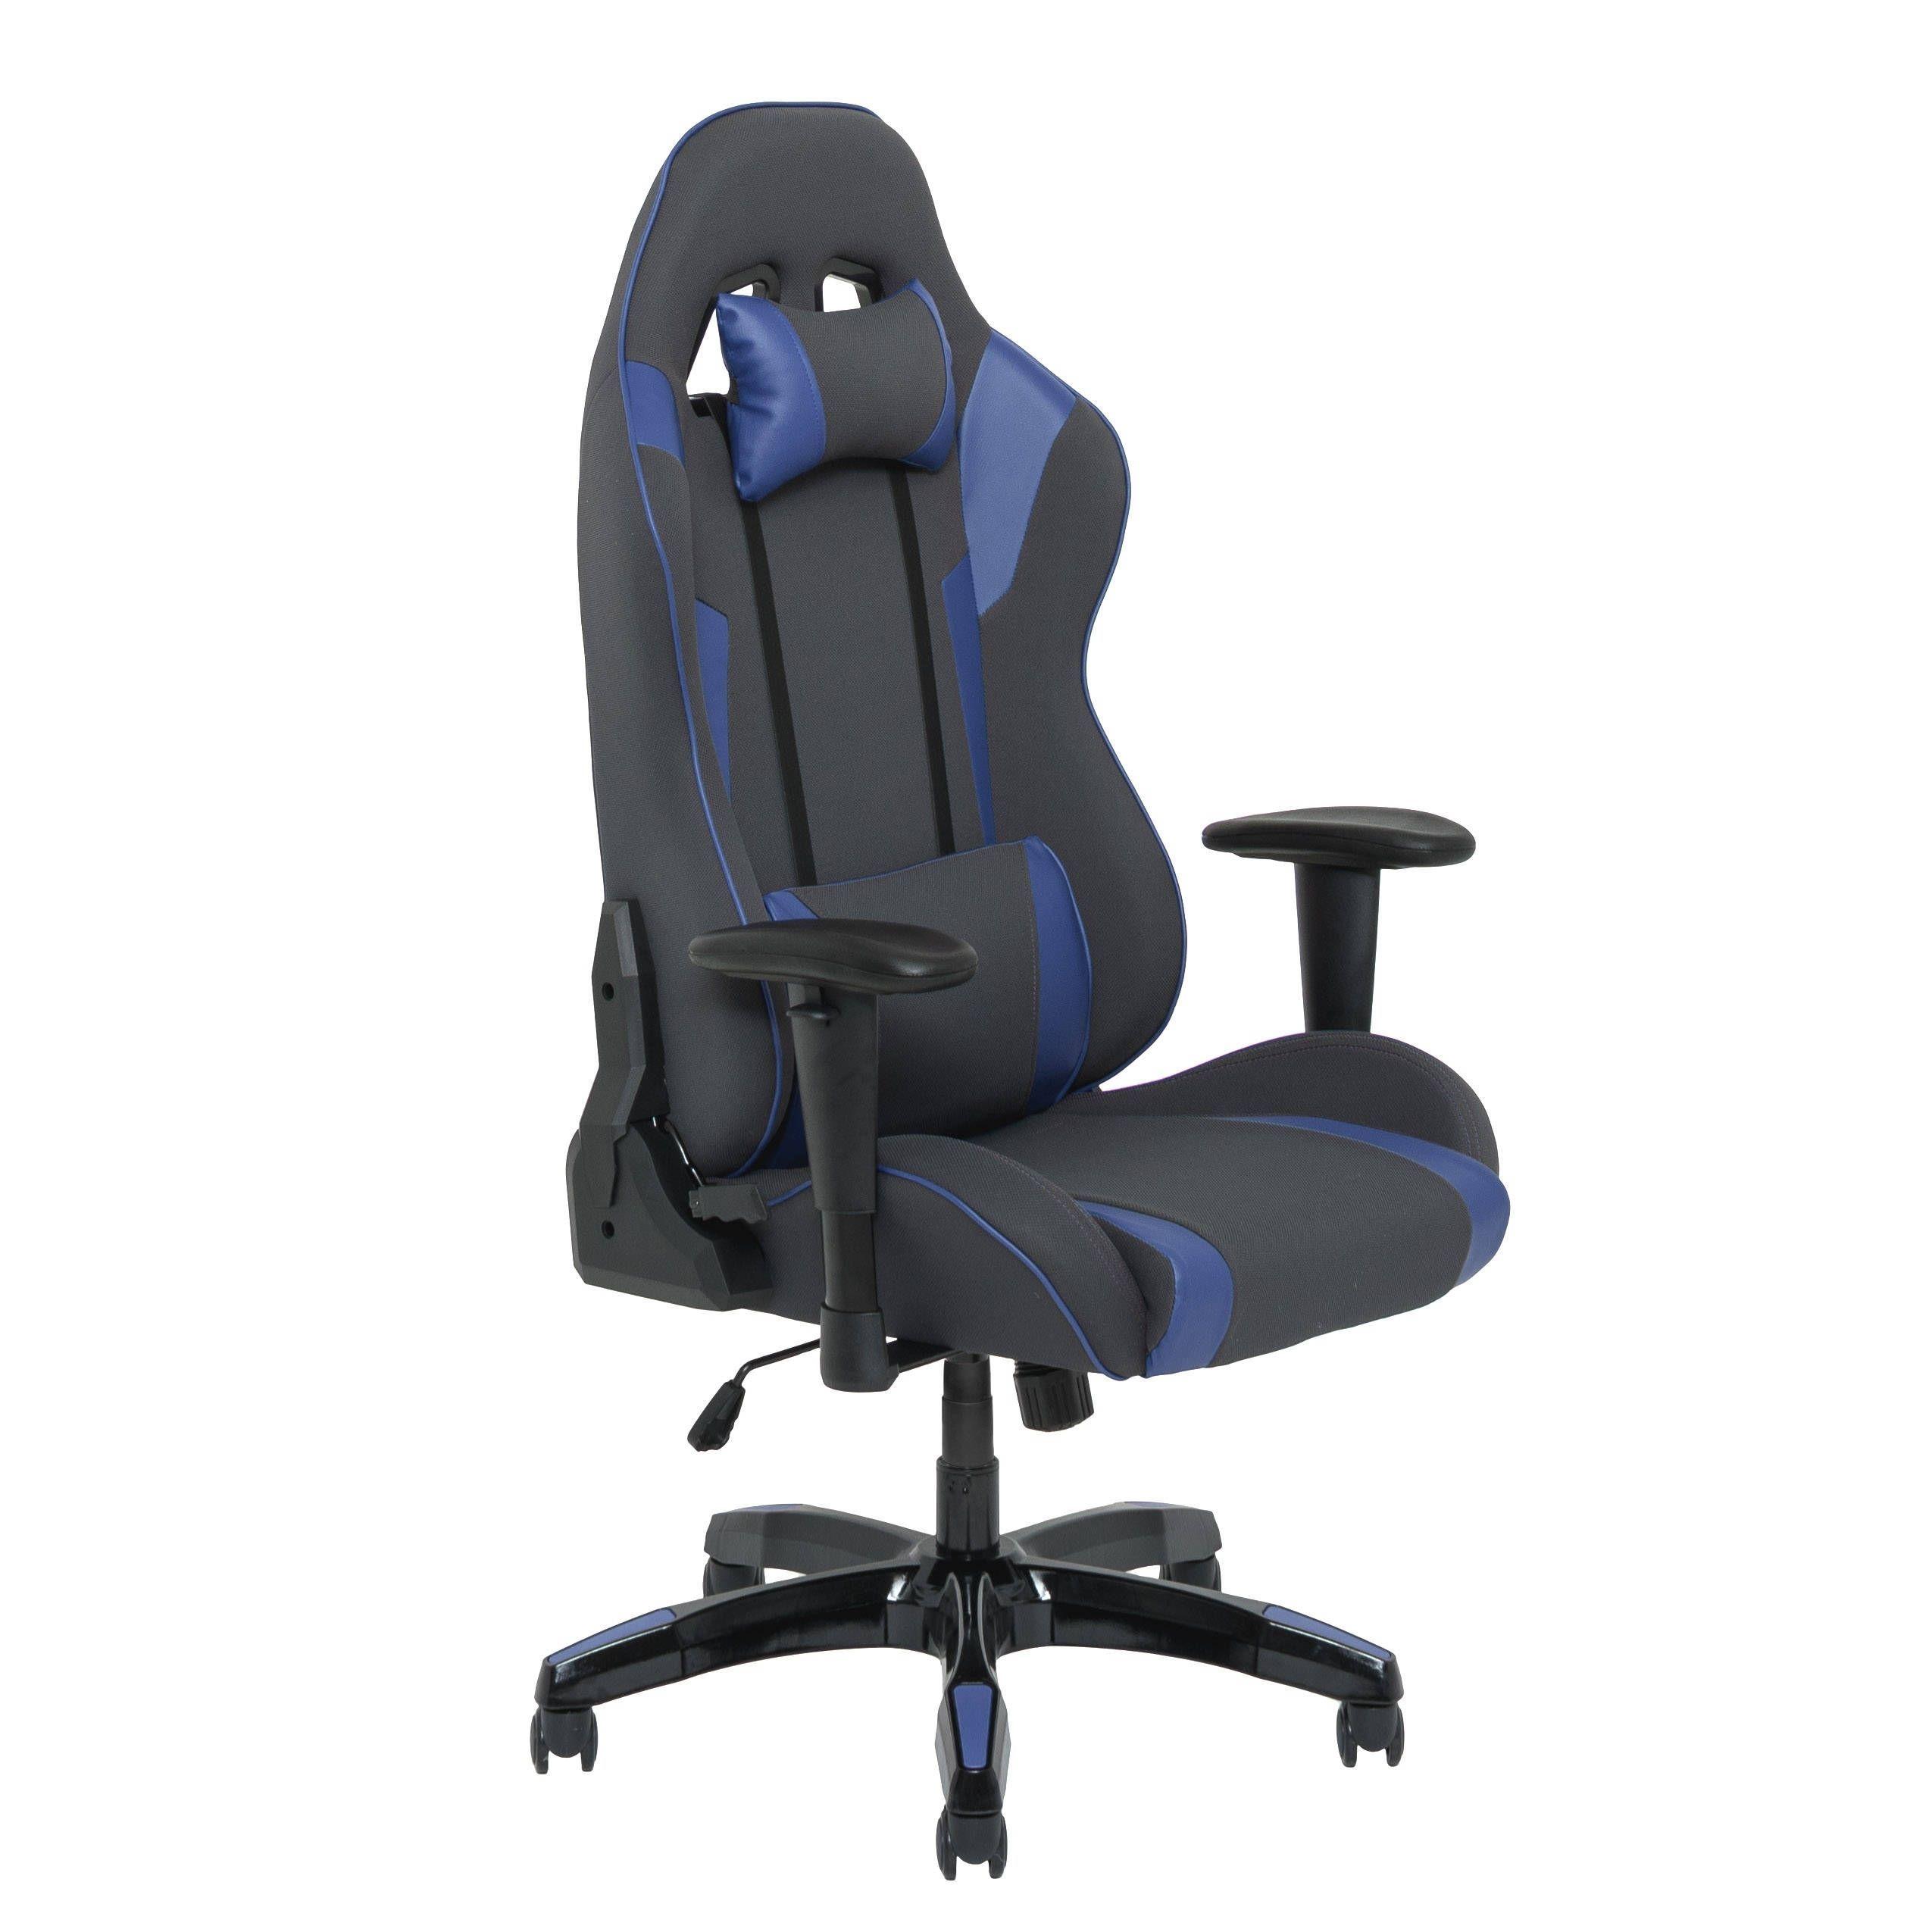 CorLiving High Back Ergonomic Gaming Chair Corliving